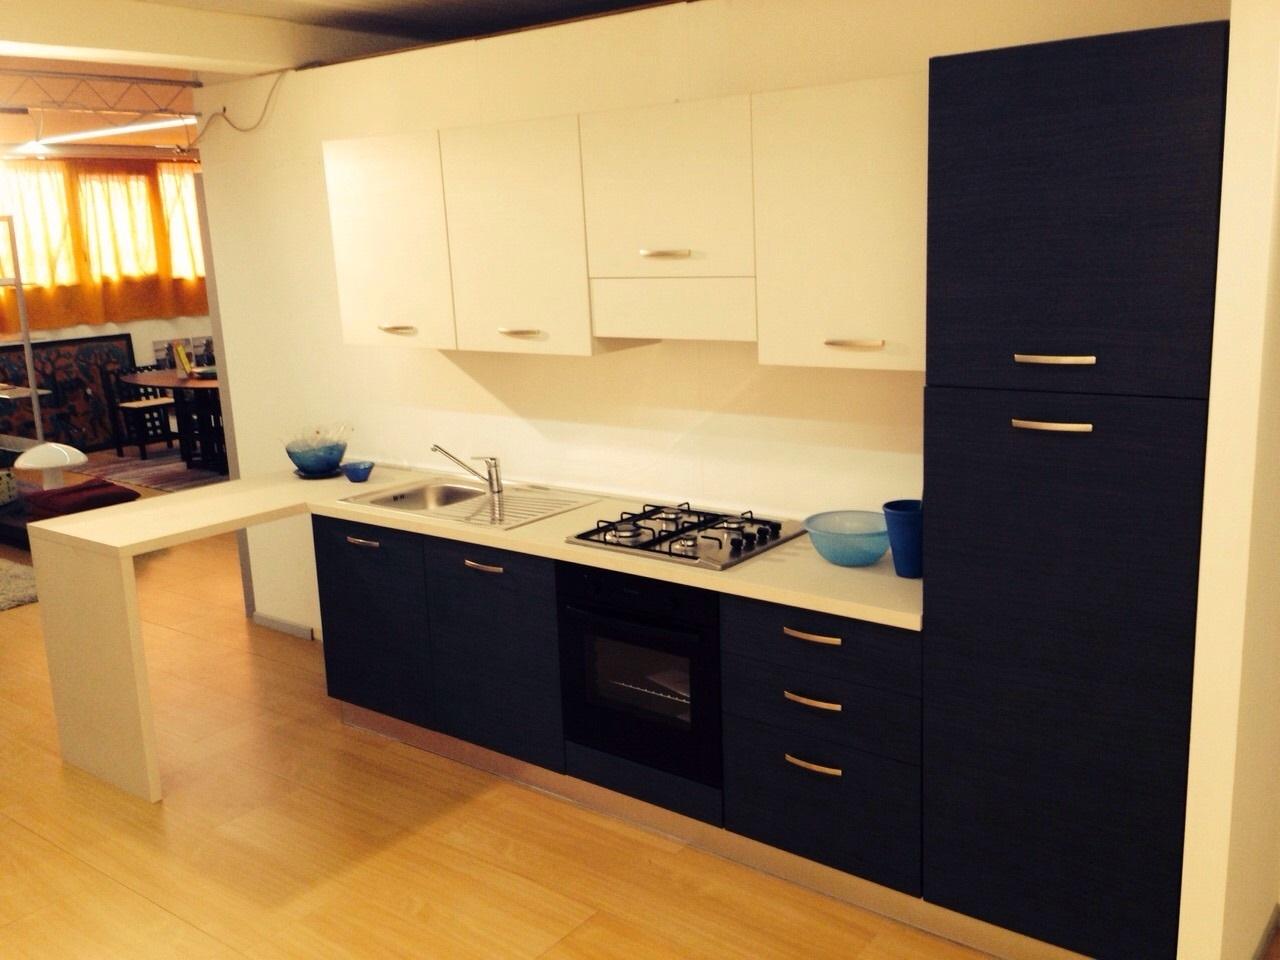 Cucina outlet mt 3 penisola cucine a prezzi scontati - Cucina 3 metri angolare ...